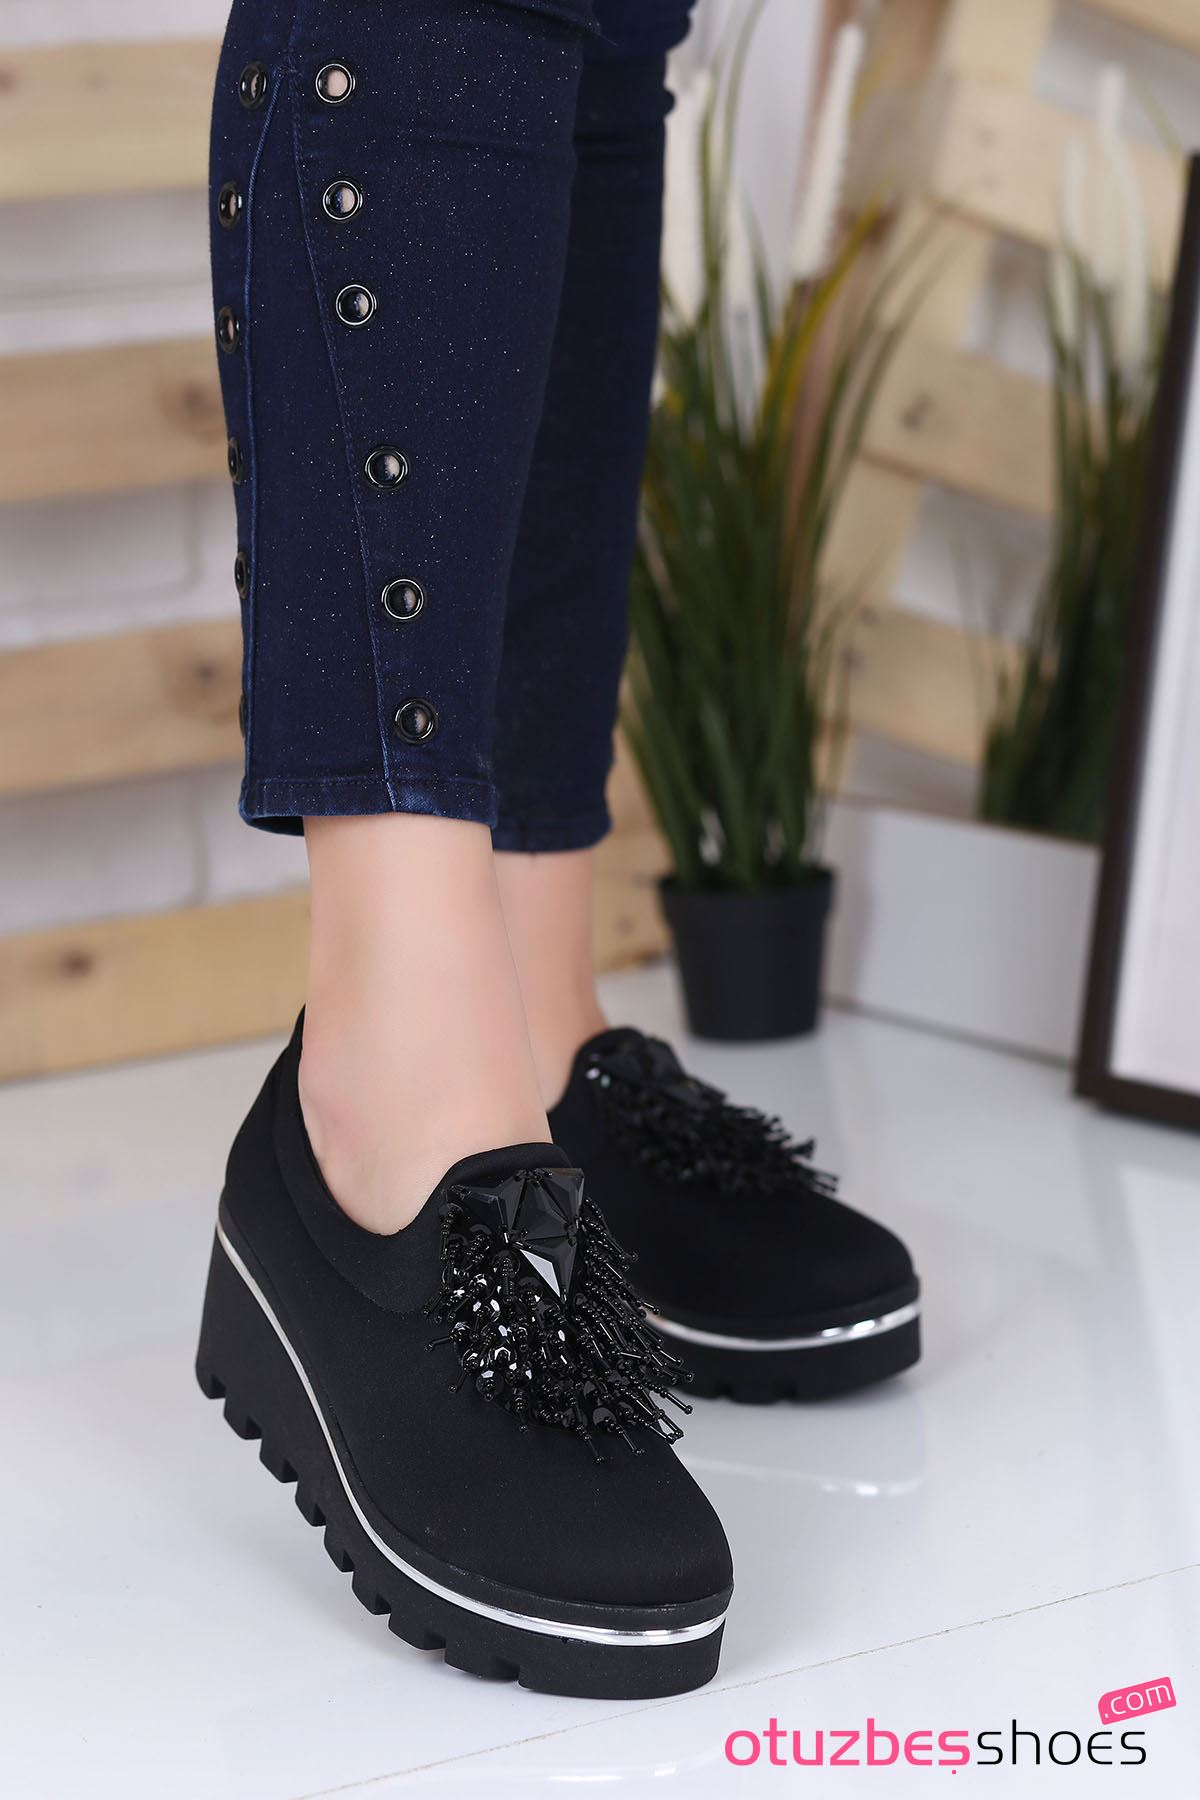 Bratz Püskül Detay Dalgıç Kumaş Dolgu Topuk Ayakkabı Siyah